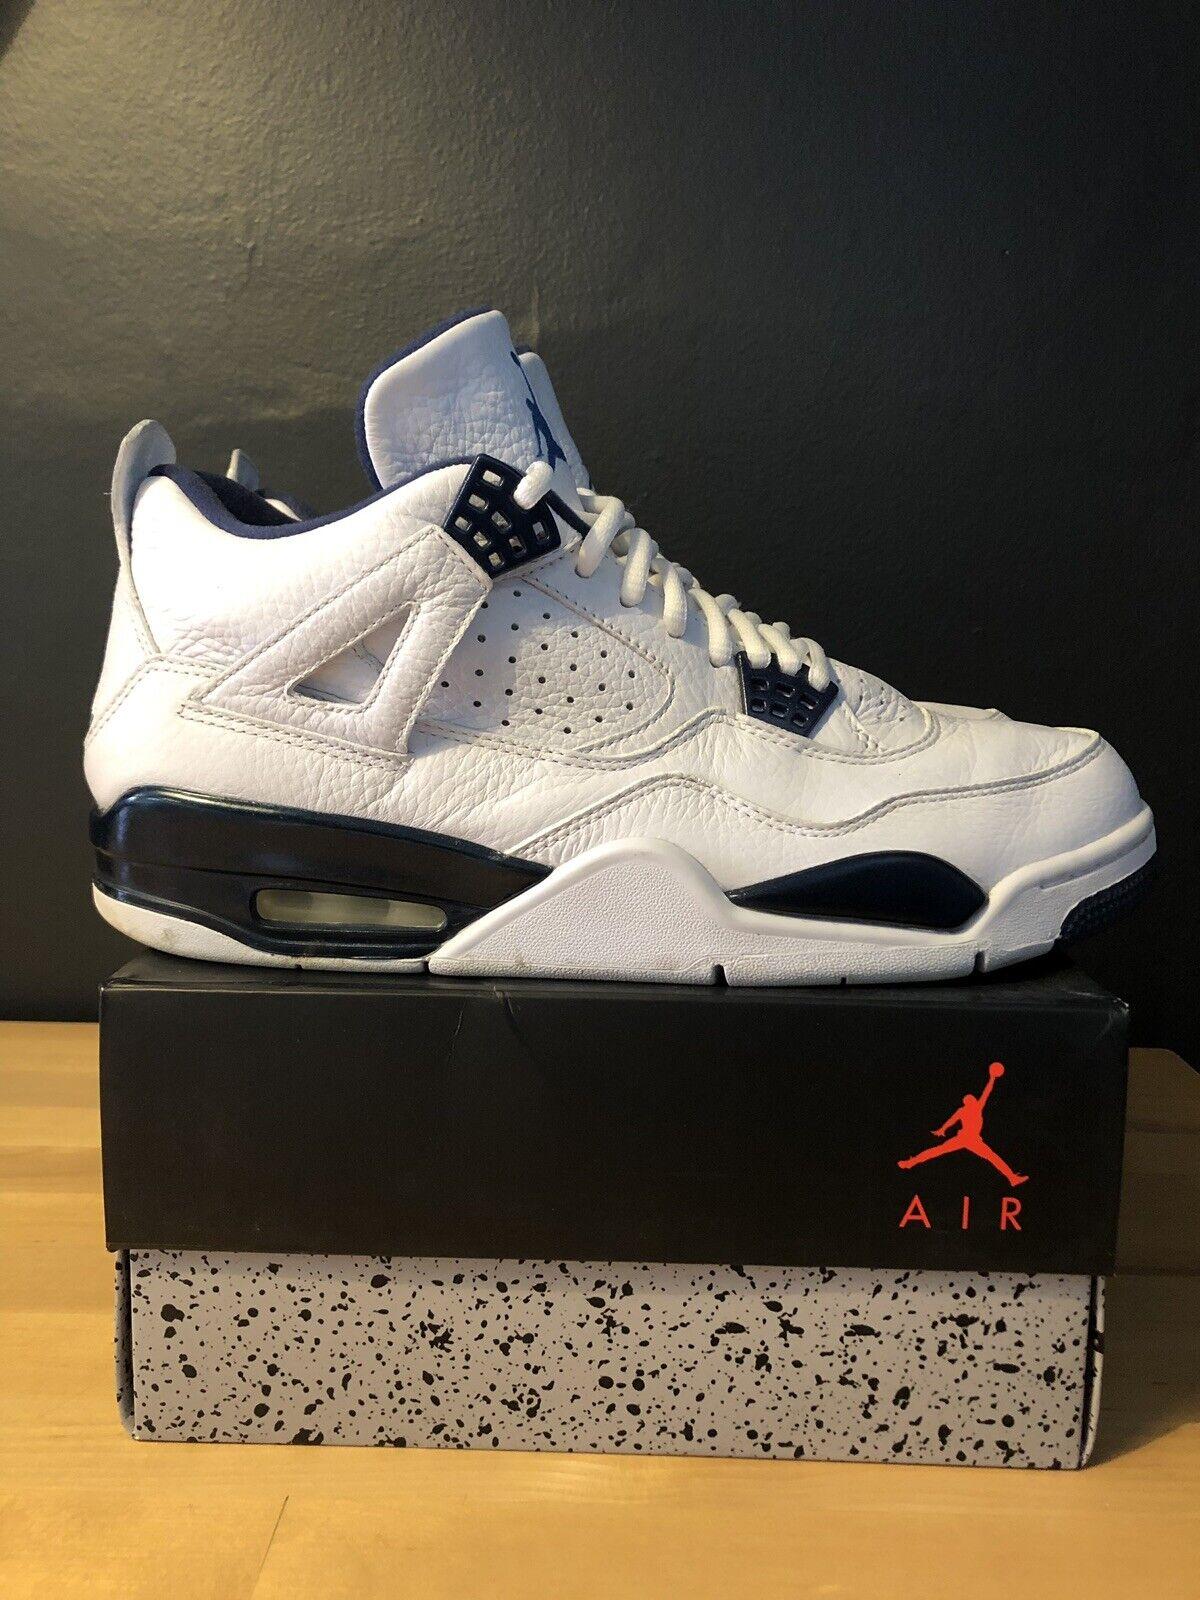 Nike Air Jordan 4 IV Retro Columbia Weiß Legend Blau UK 9 US 10